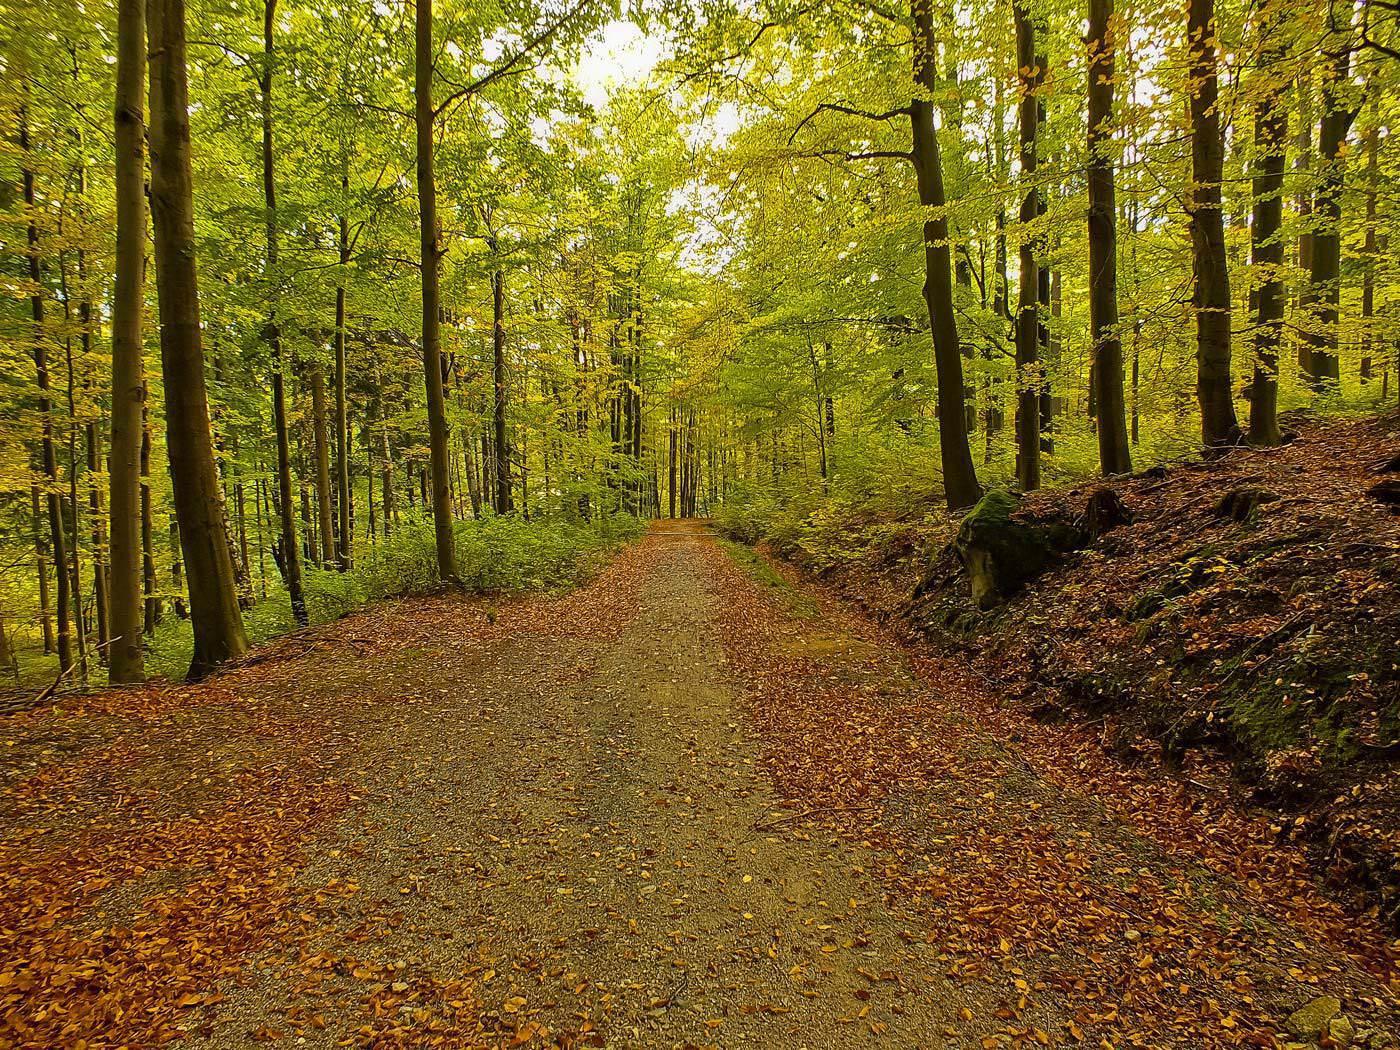 Autumn in Karkonosze